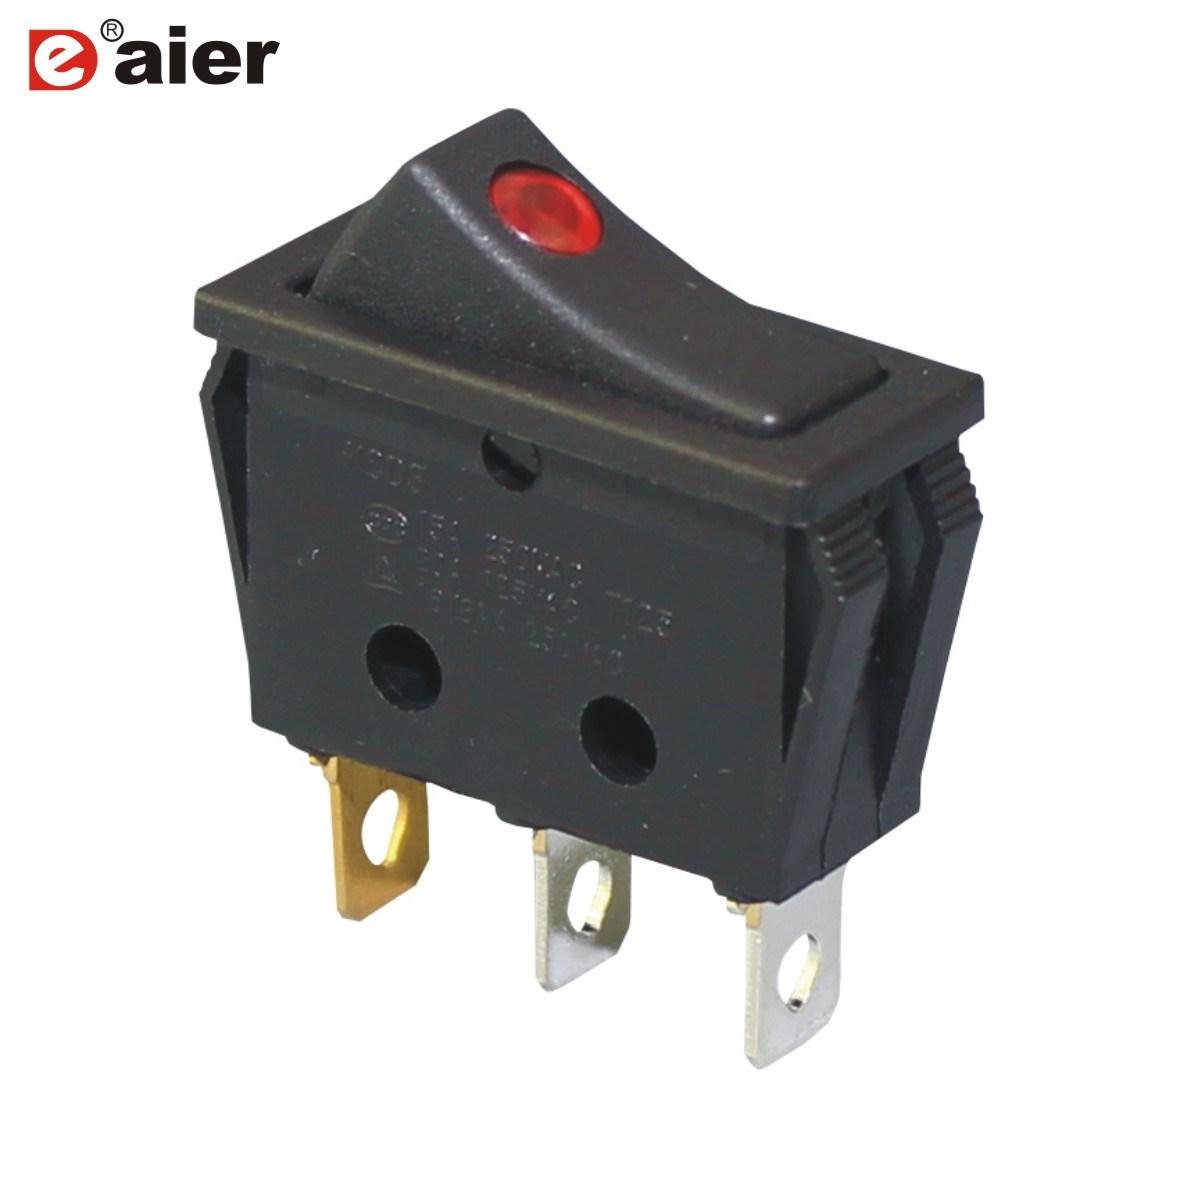 China Illuminated 24V/12V Rocker Switch with Light Indicator - China ...